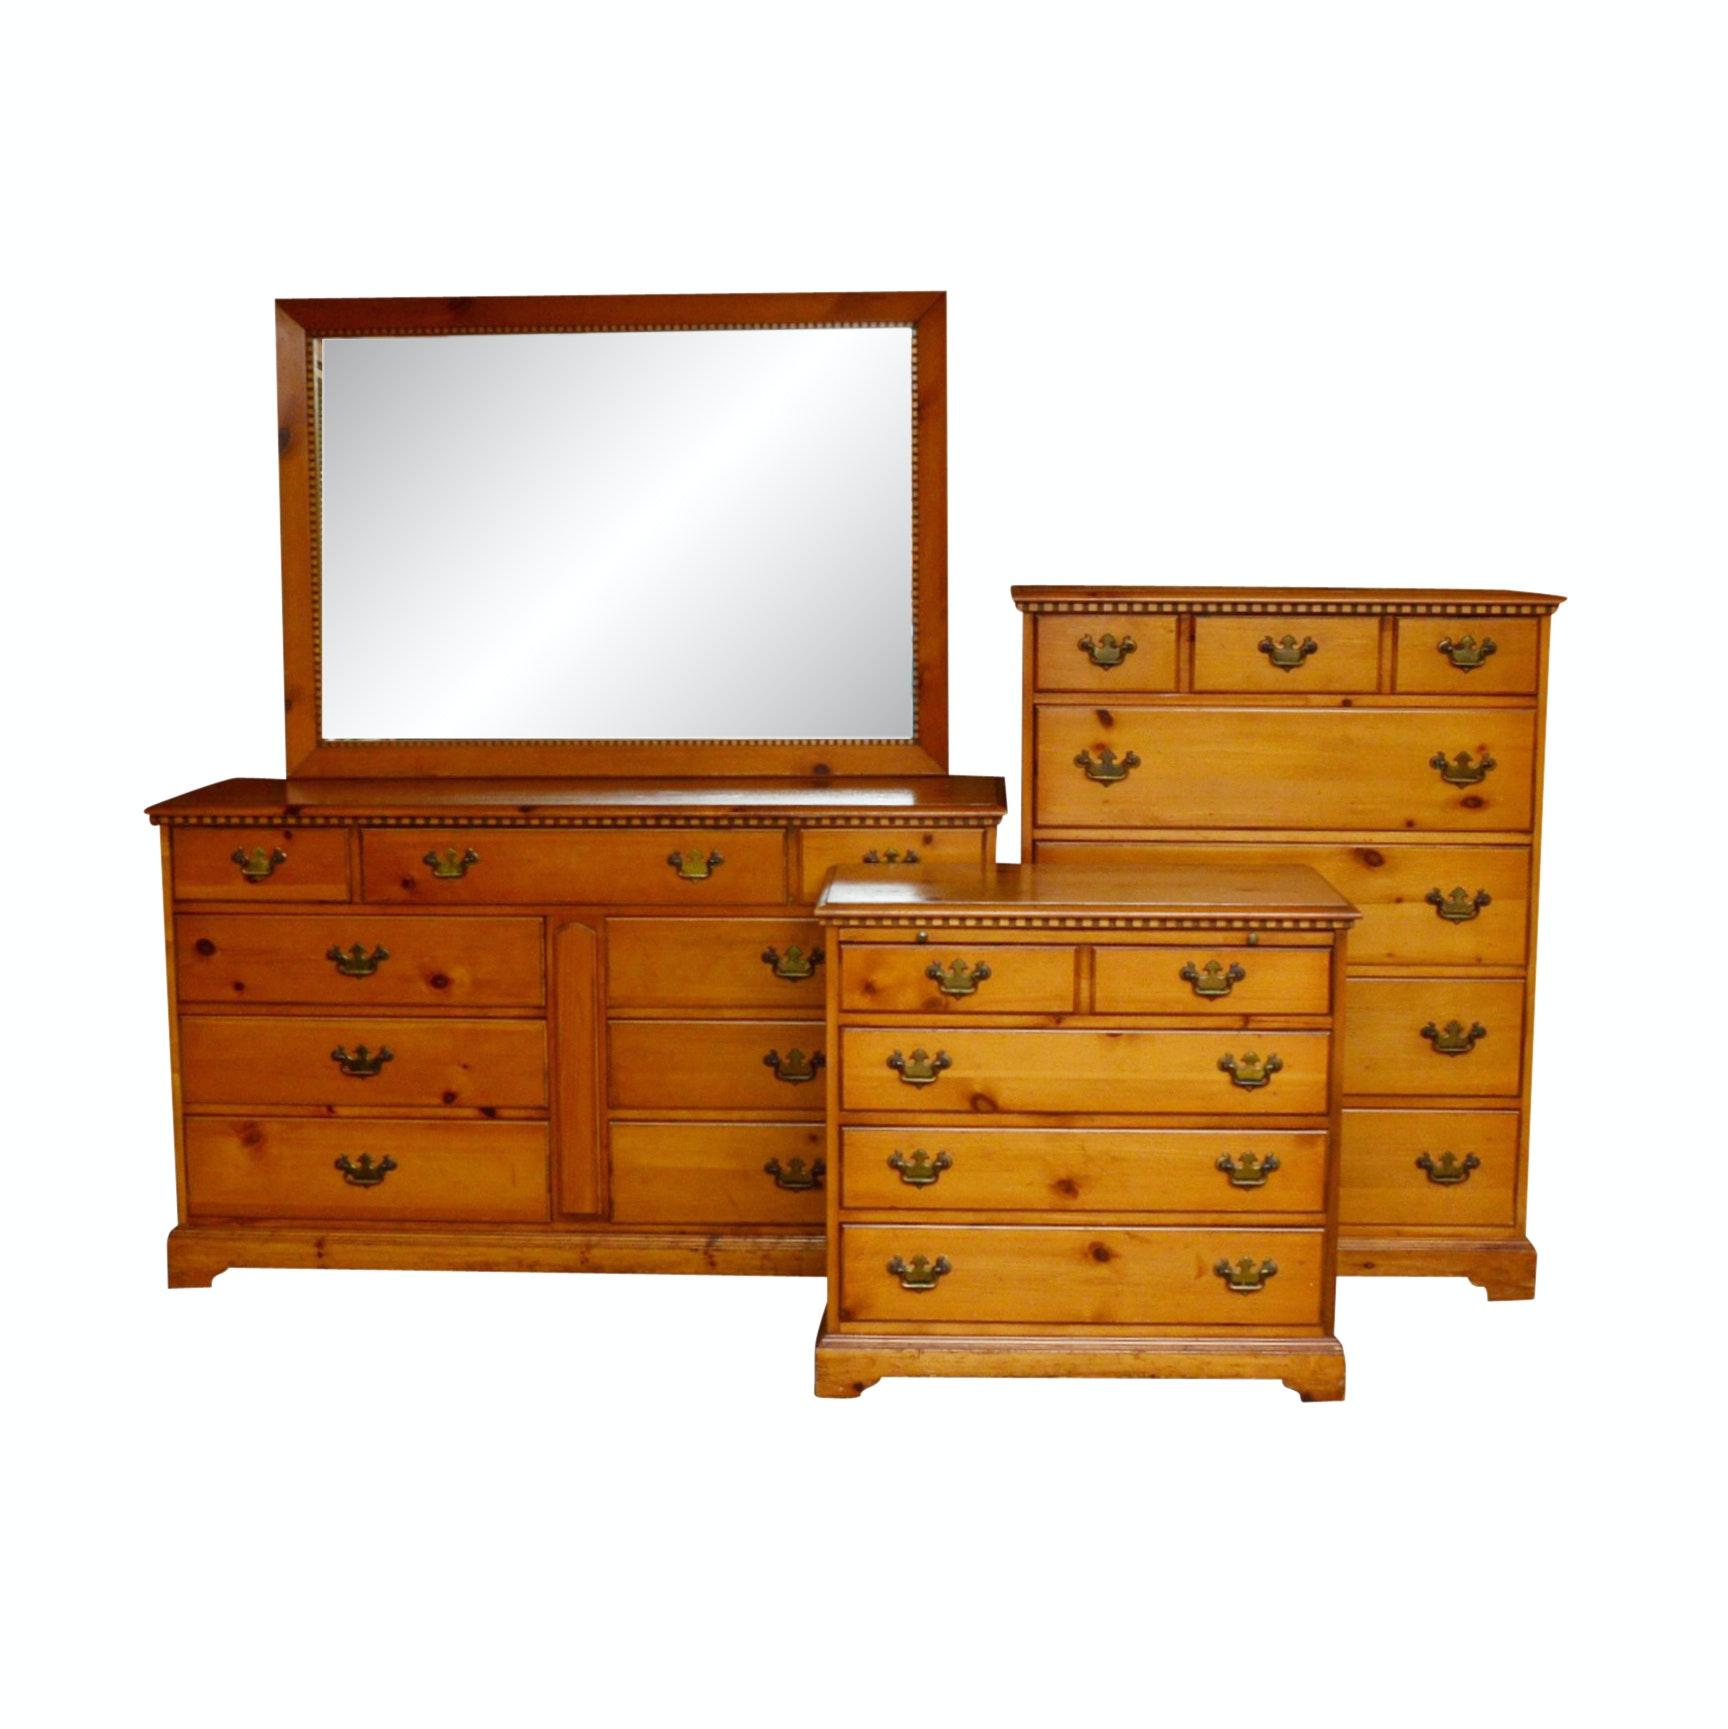 Trio of Pine Dressers